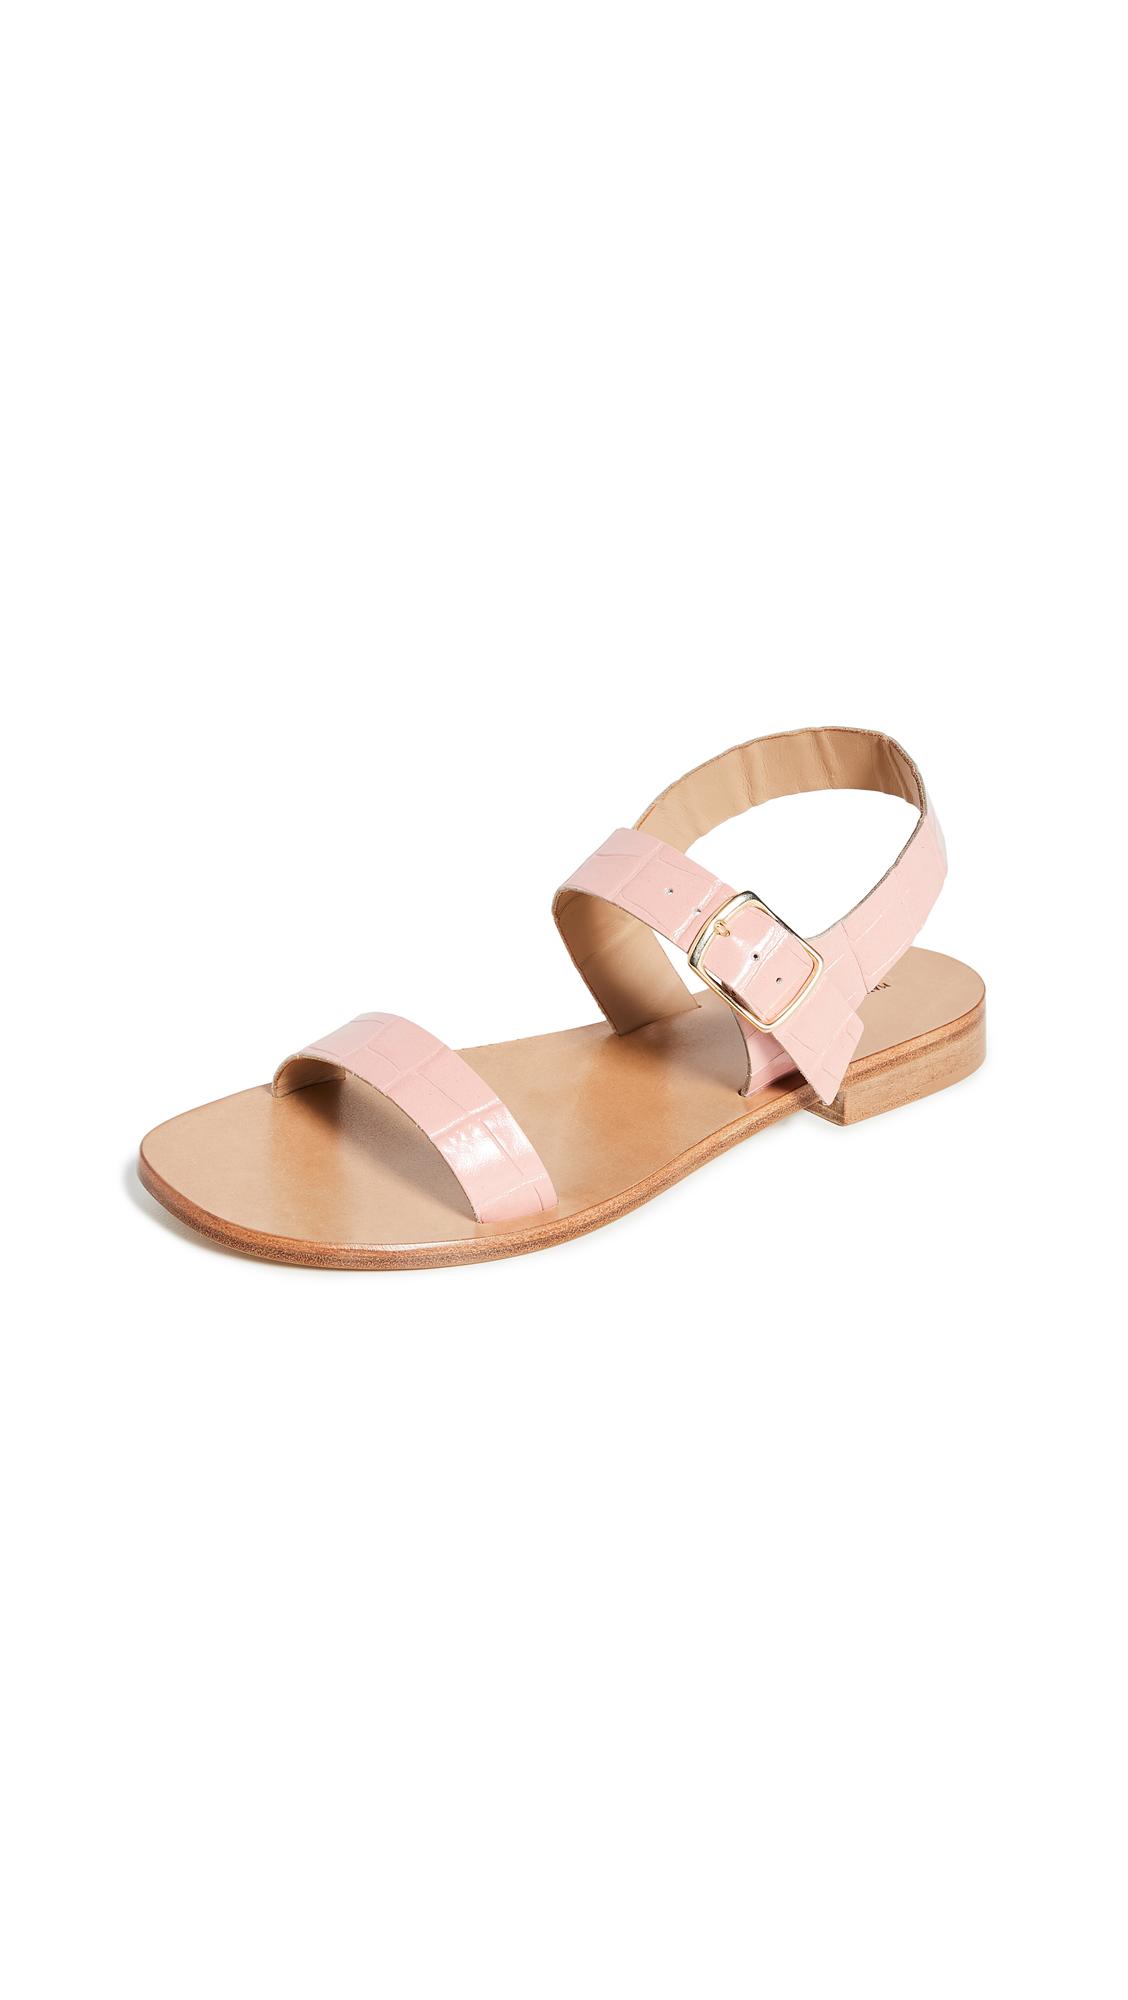 Mansur Gavriel Buckle Sandals - 50% Off Sale